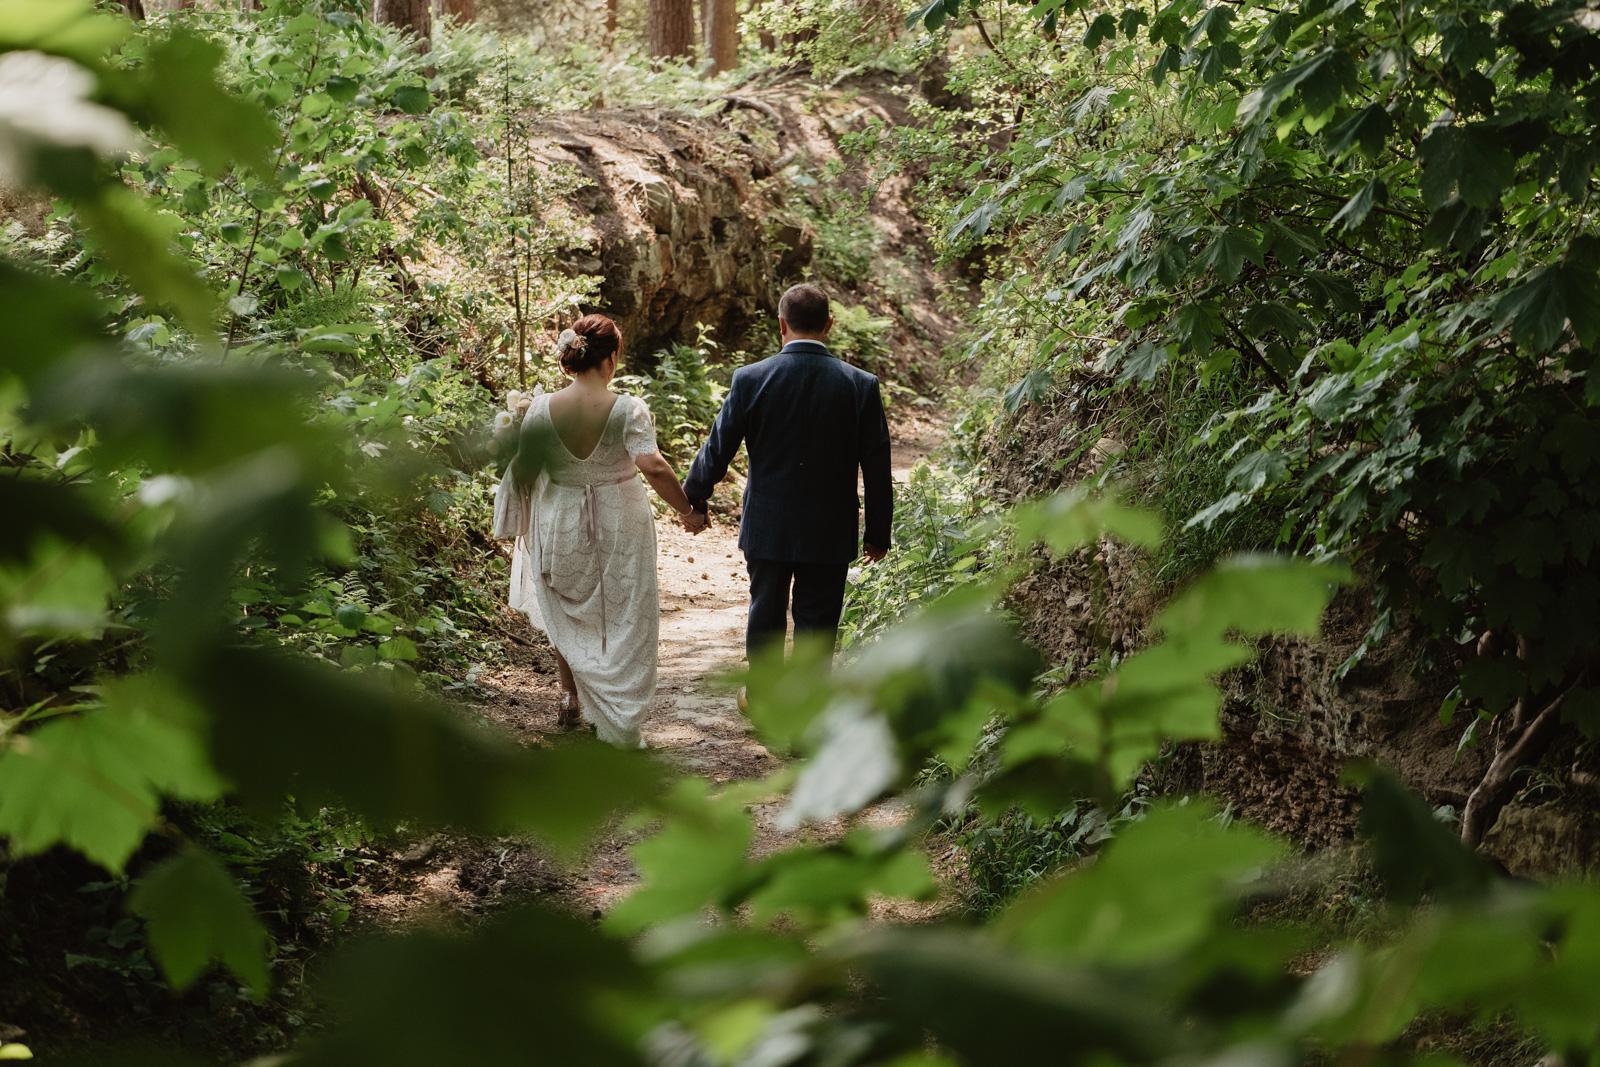 Bridgette-Dahlia-Blush-Silk-Lace-Wedding-Dress-Kate-Beaumont-Sheffield-Ivory-Fayre-17.jpg